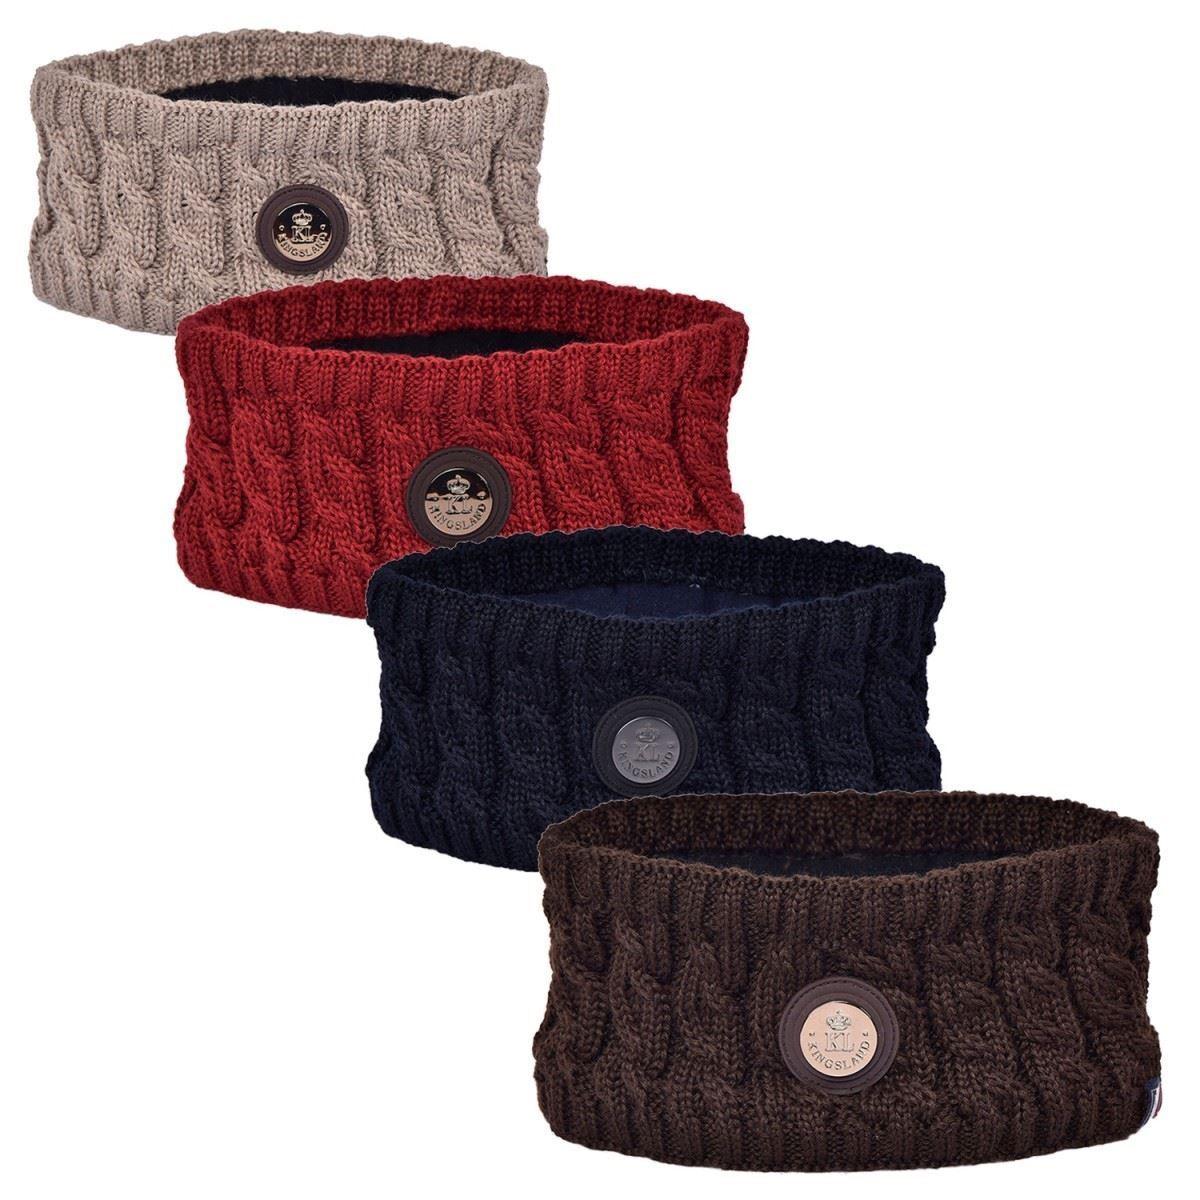 Kingsland Karluk Headband - Knitted Horse Riding Riding Riding Equestrian Winter Warm Outdoor 850dca